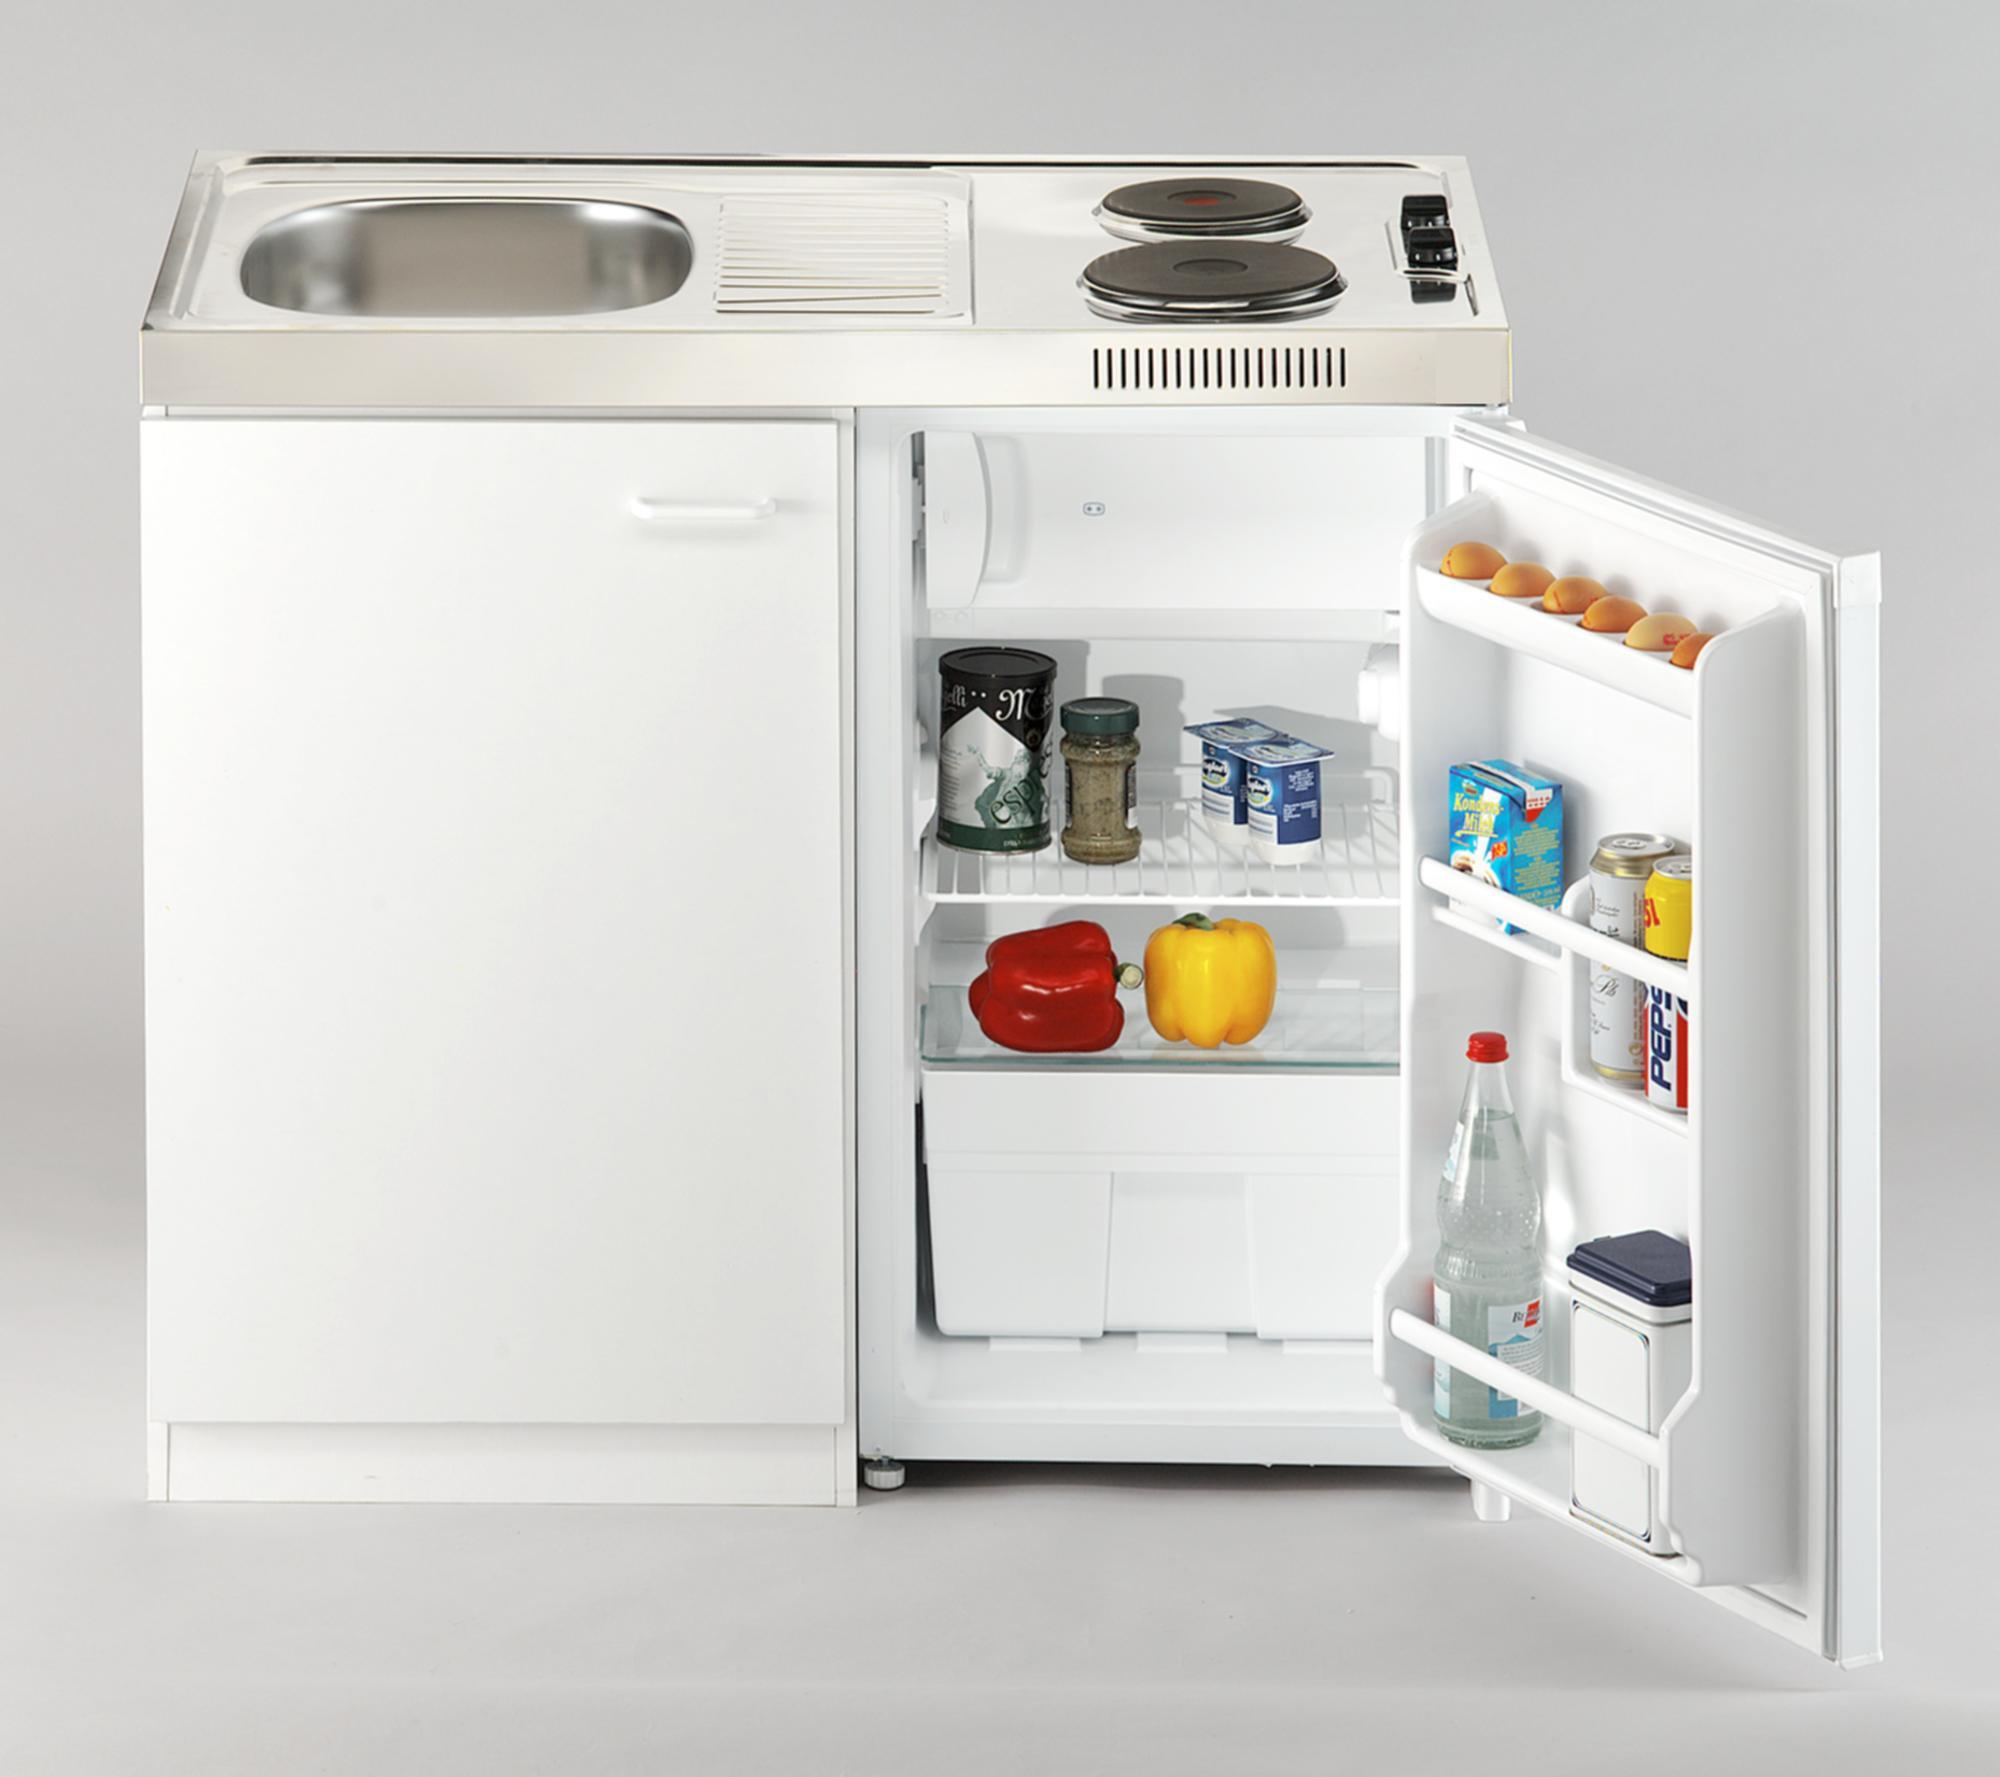 Full Size of Miniküche Mit Kühlschrank 100 Cm Miniküche Mit Kühlschrank Roller Miniküche 1 20 M Mit Kühlschrank Miniküche Mit Kühlschrank Preisvergleich Küche Miniküche Mit Kühlschrank